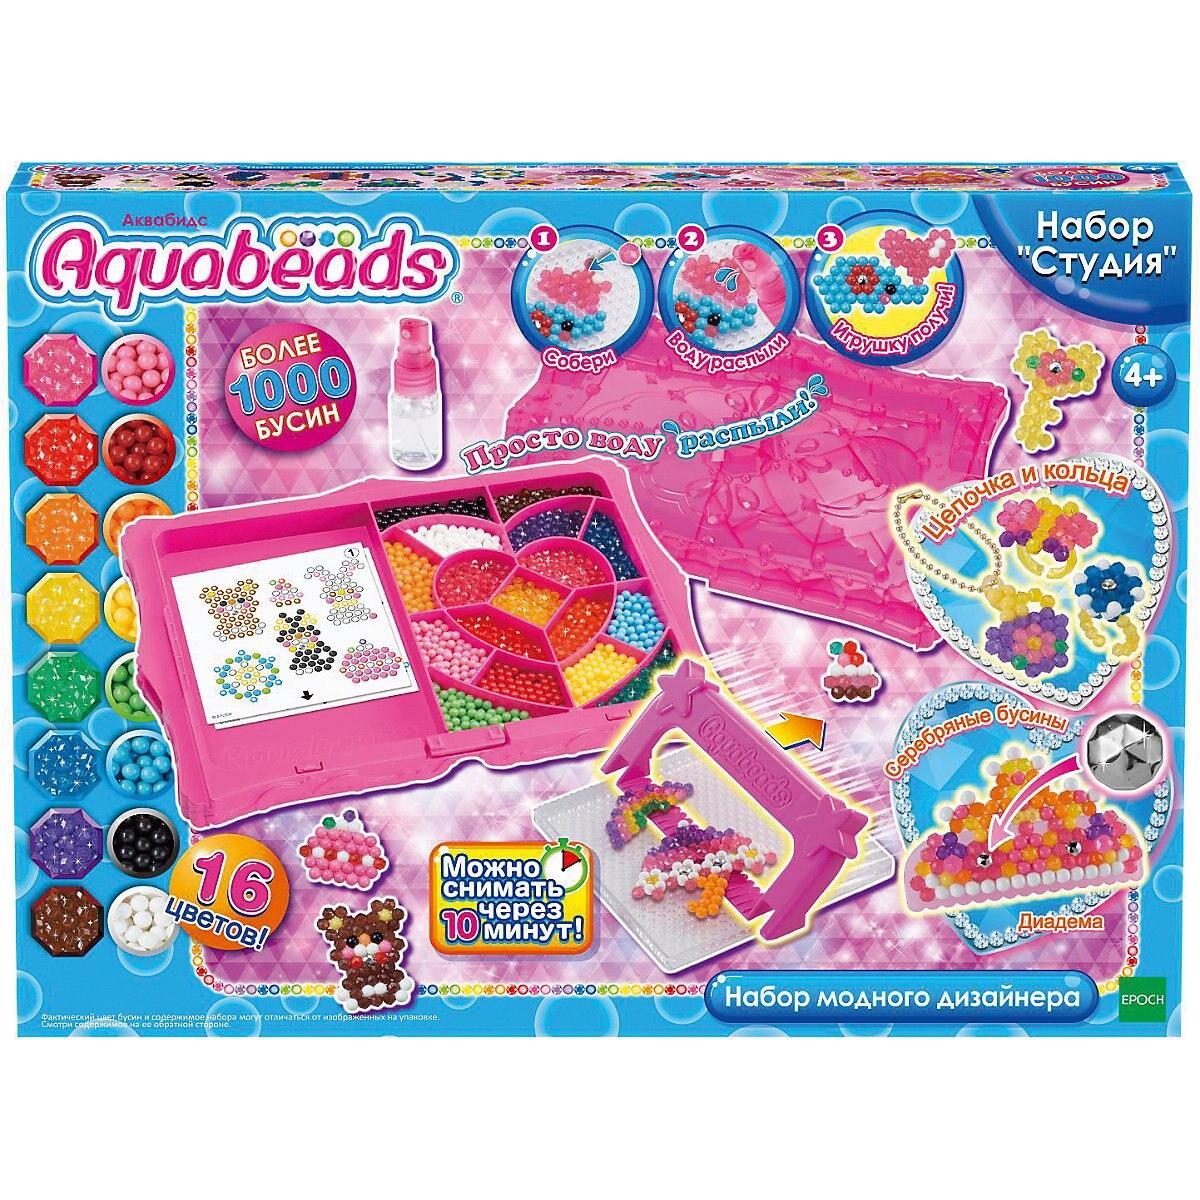 Aquabeads Beads Toys 7966847 Creativity Needlework For Children Set Kids Toy Hobbis Arts Crafts DIY MTpromo